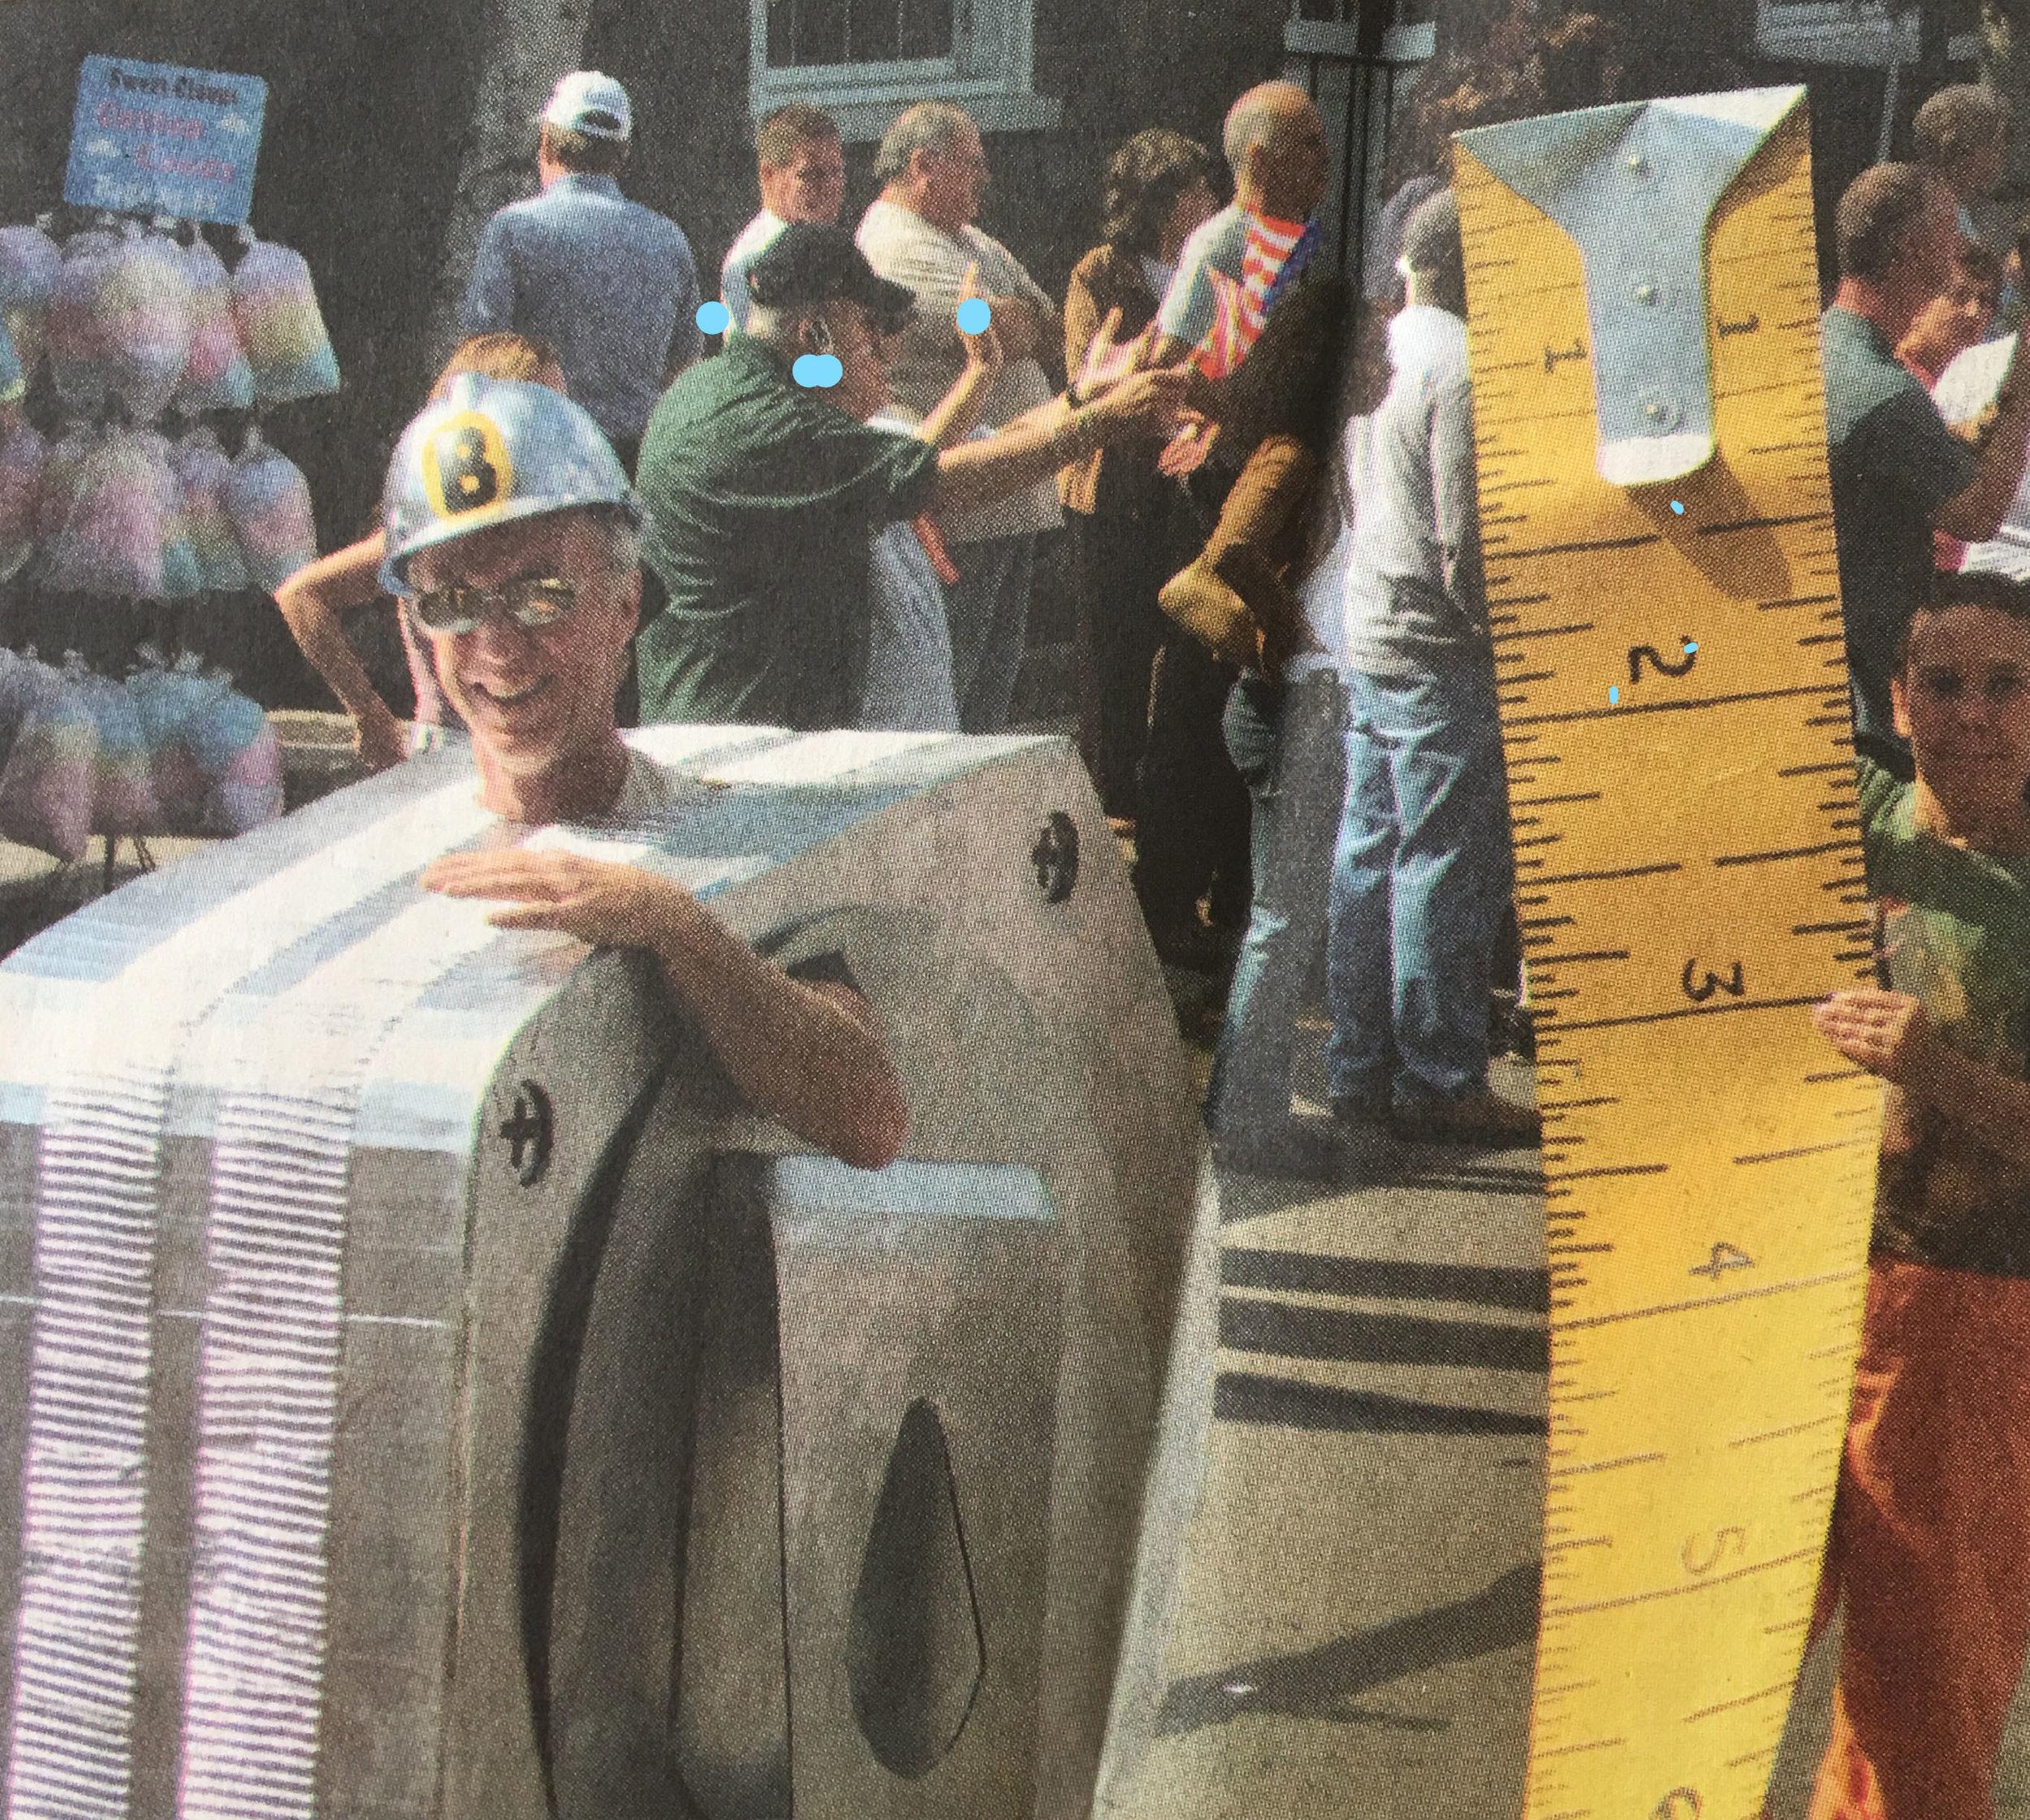 Spirit of Beacon Day2007, courtesy Beacon Historical Society / Beacon Free Press